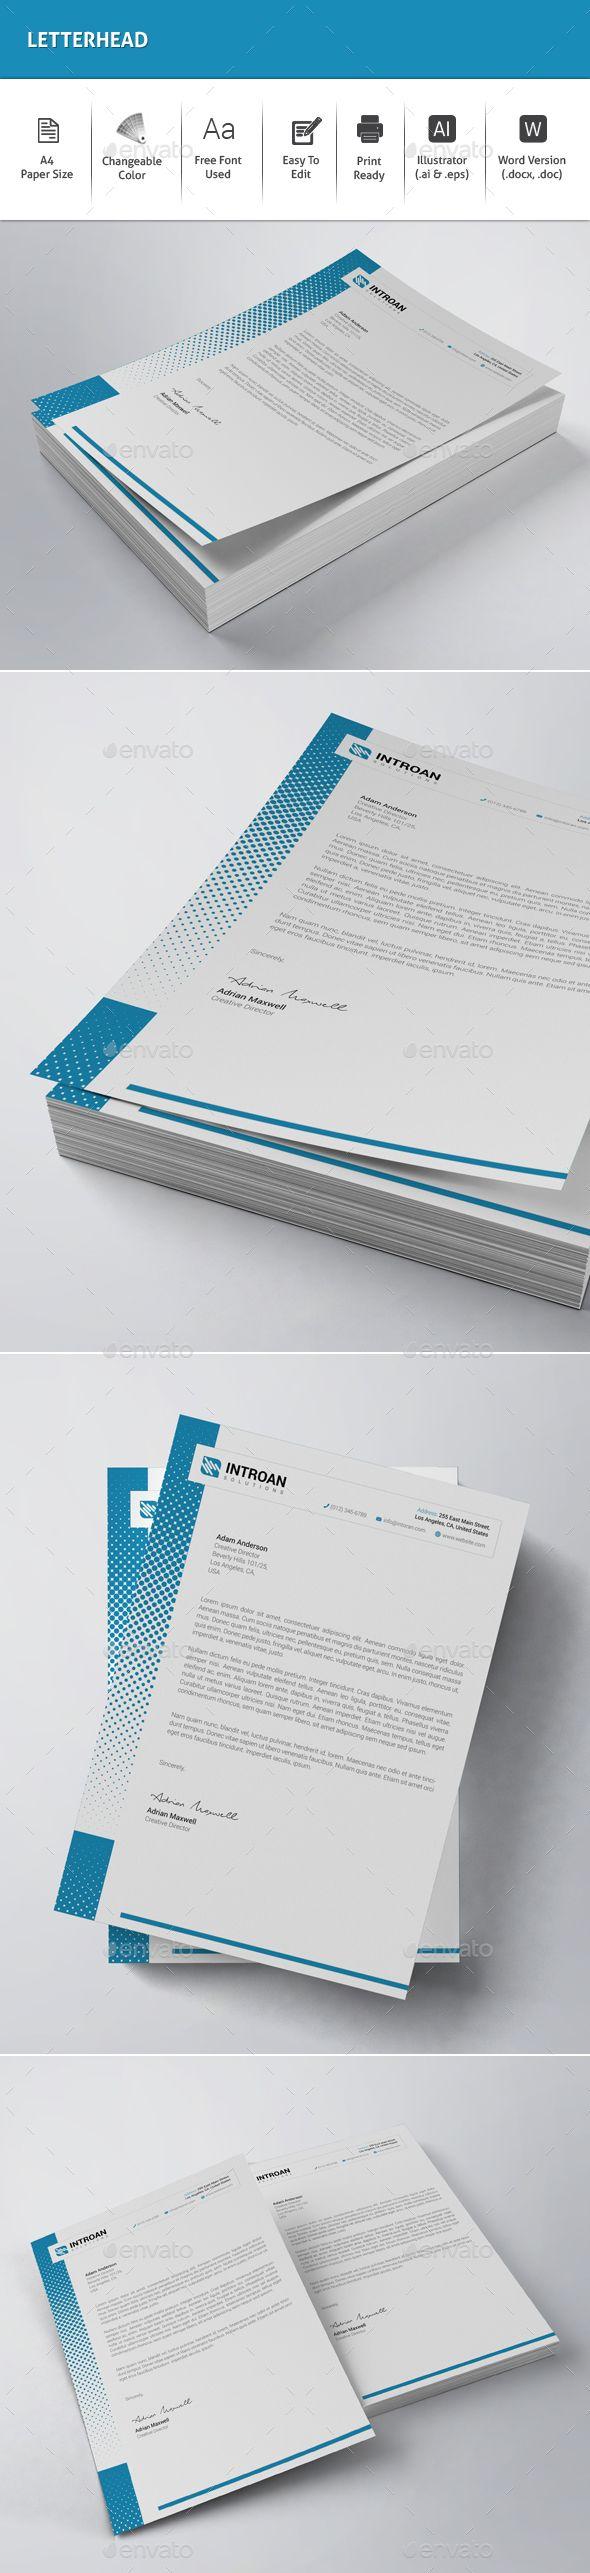 17 Best ideas about Letterhead Design on Pinterest | Letterhead ...